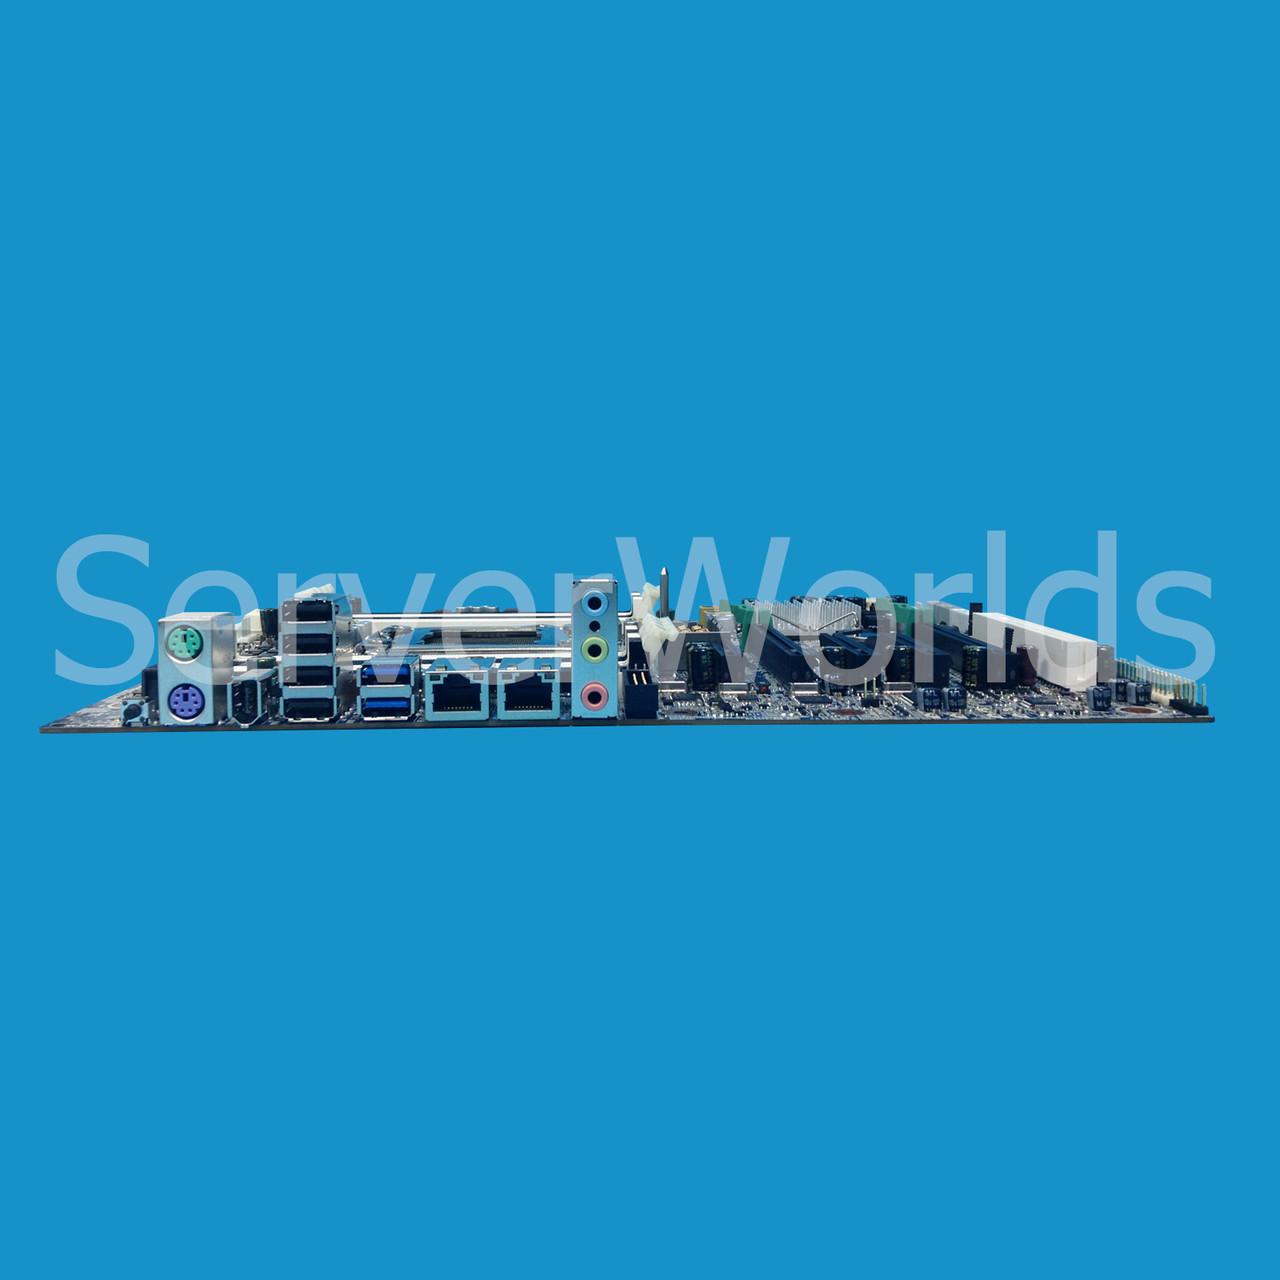 HP 619559-001 | Z620 DDR3 System Board - Serverworlds